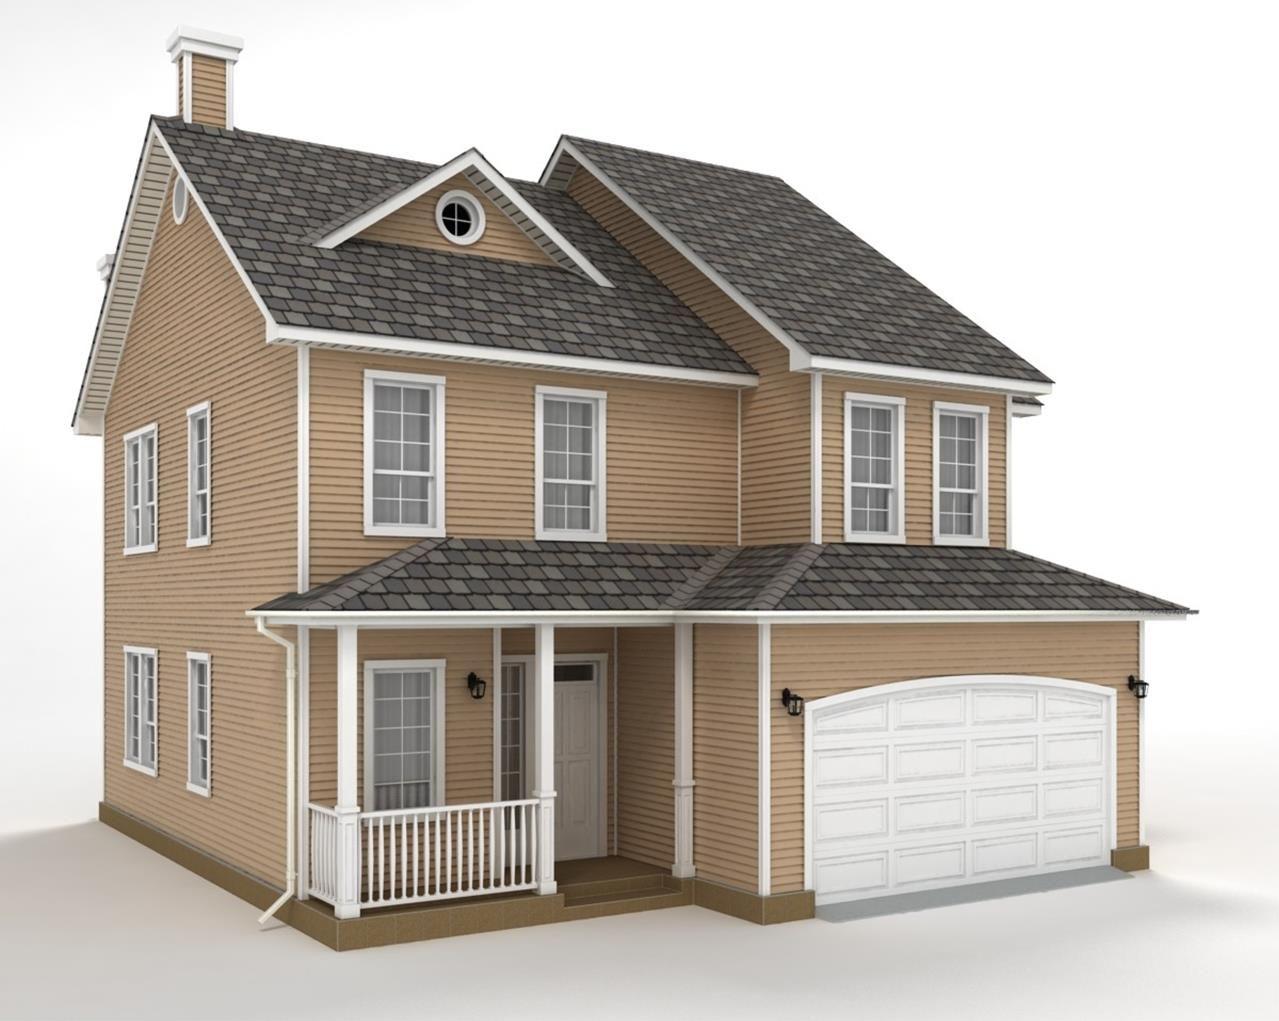 Projeto casa em 3d projetos em 3d pinterest for Casas 3d